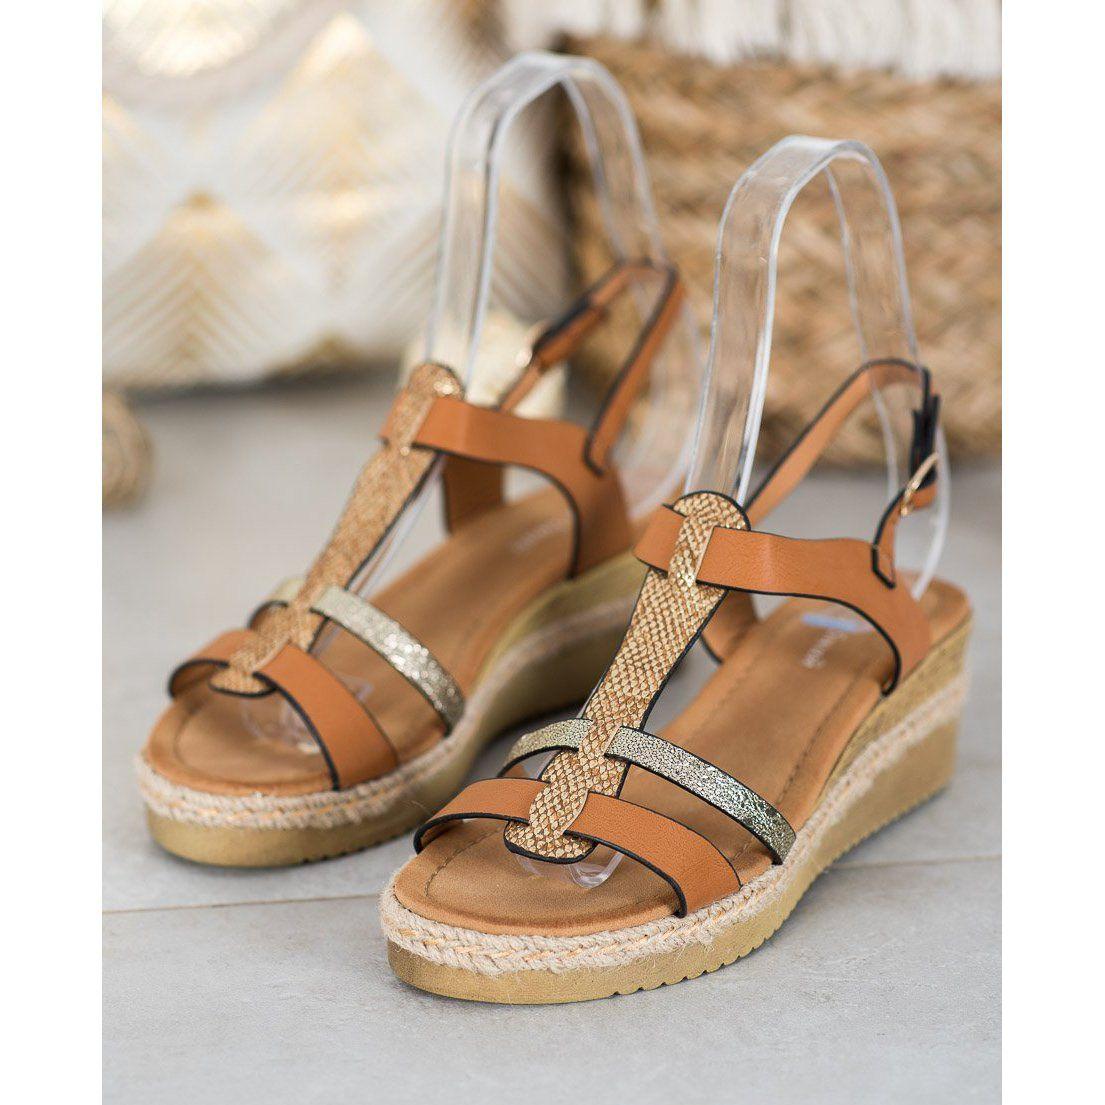 Small Swan Sandalki Na Koturnie Brazowe Zolte Shoes Sandals Fashion